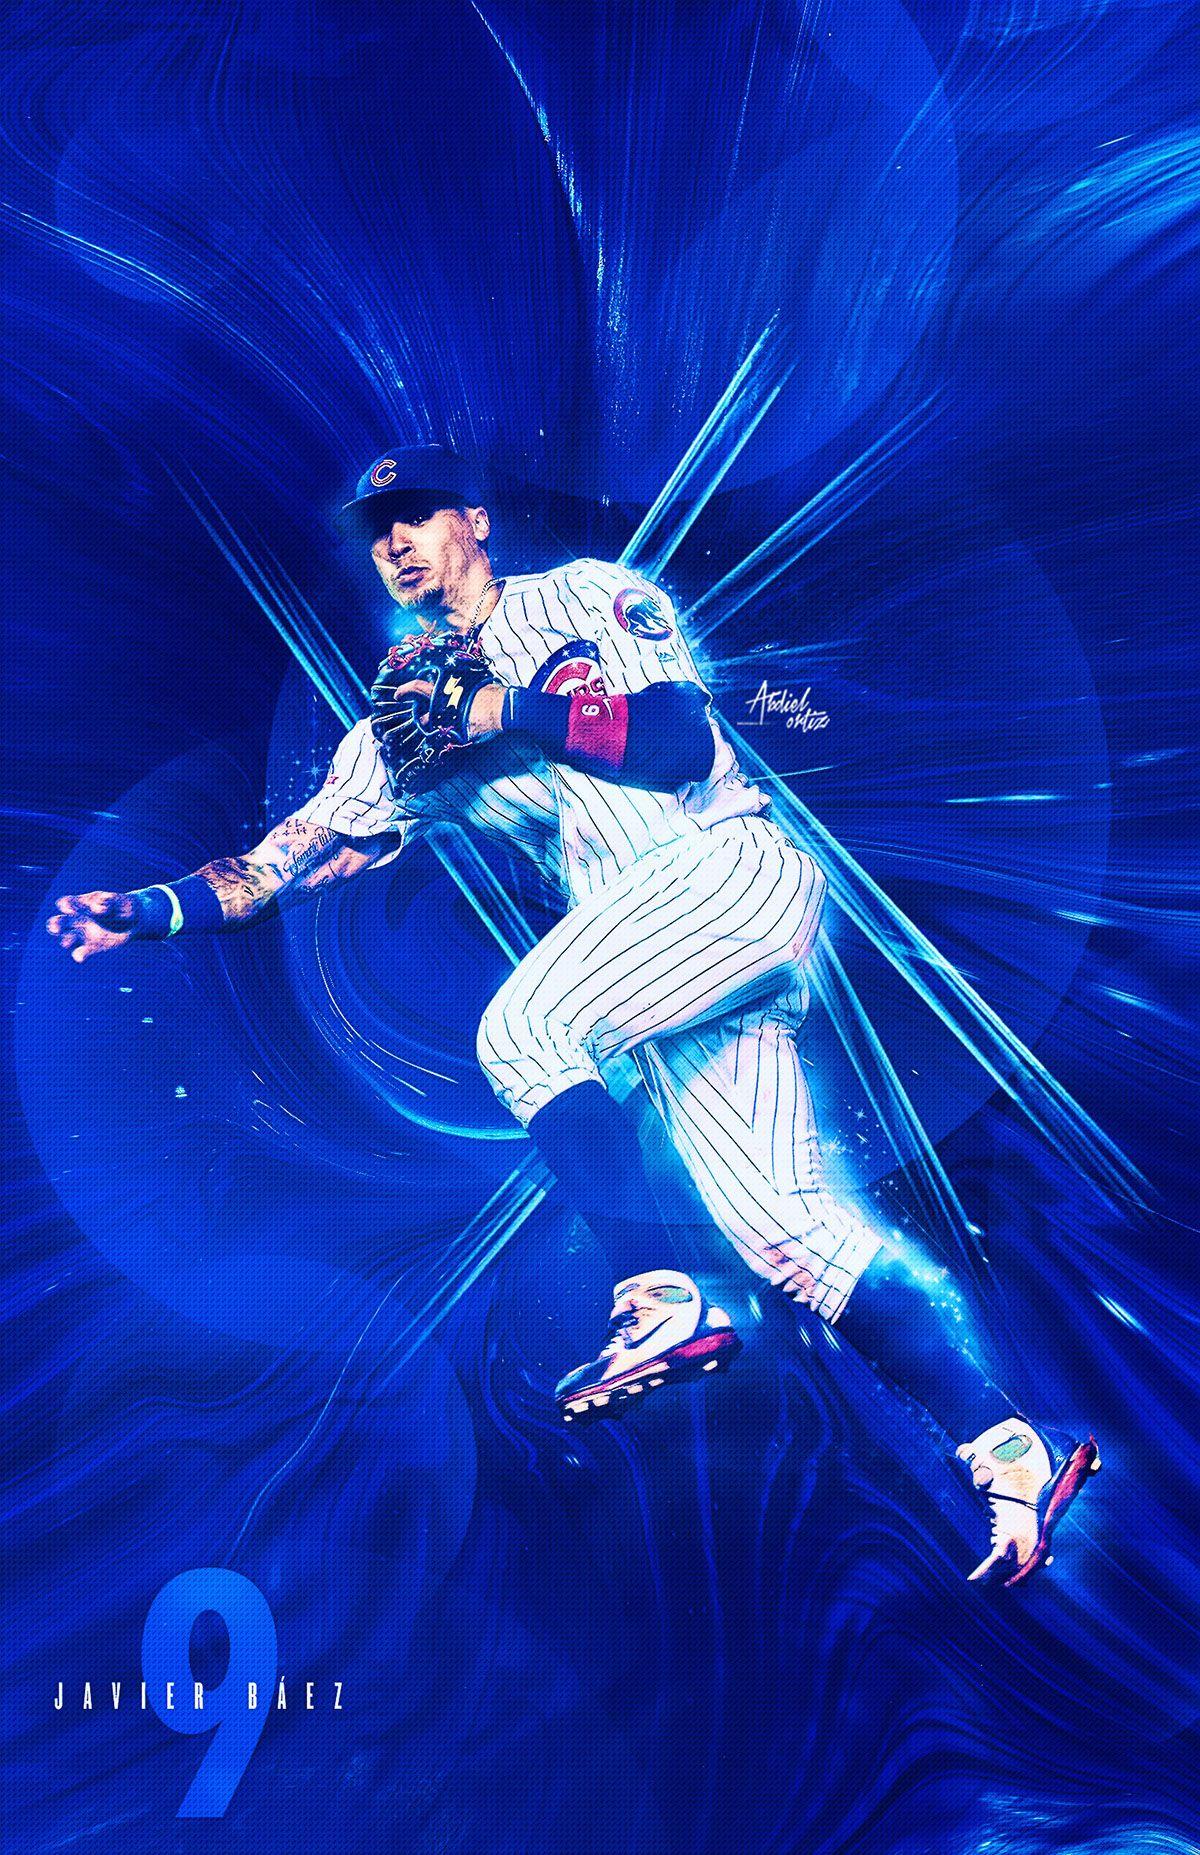 Pr Mlb On Behance Chicago Cubs Wallpaper Cubs Baseball Chicago Cubs Baseball